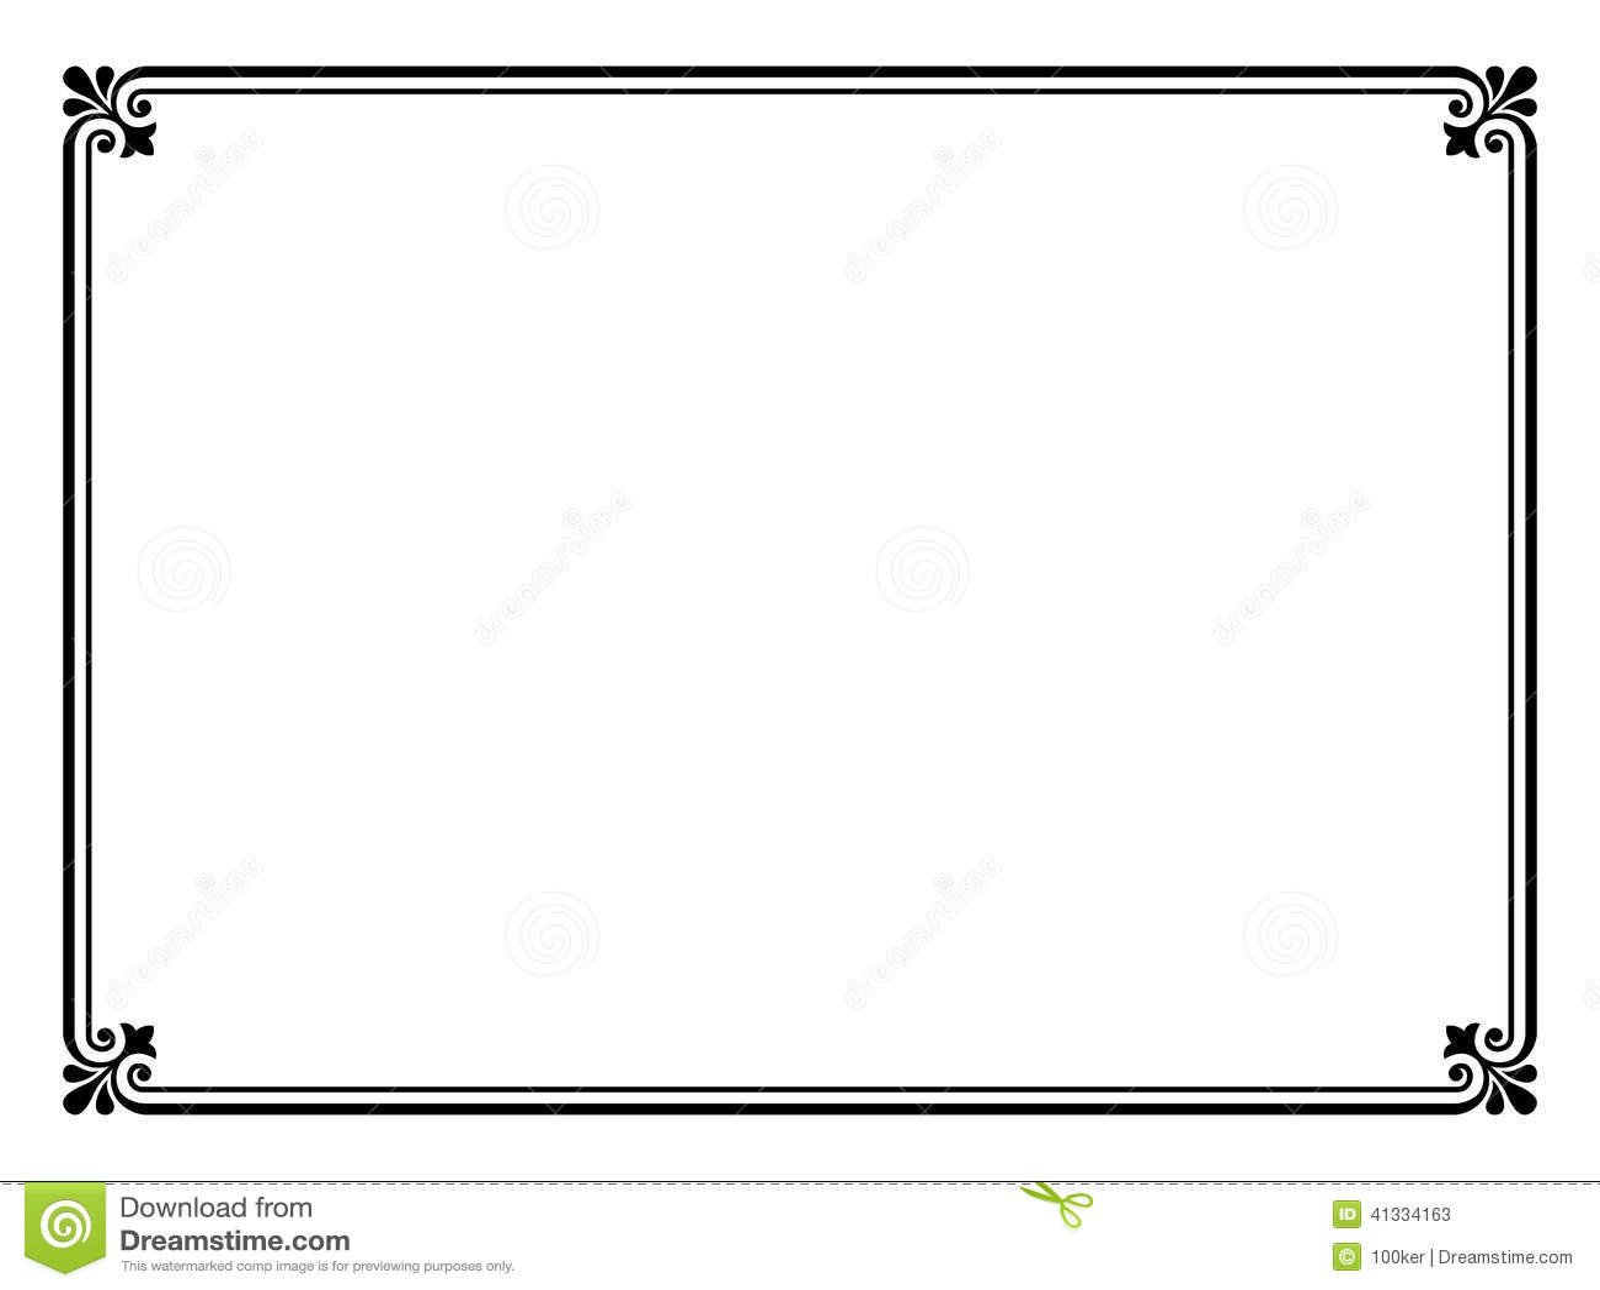 Simple Black Ornamental Decorative Frame Stock Vector